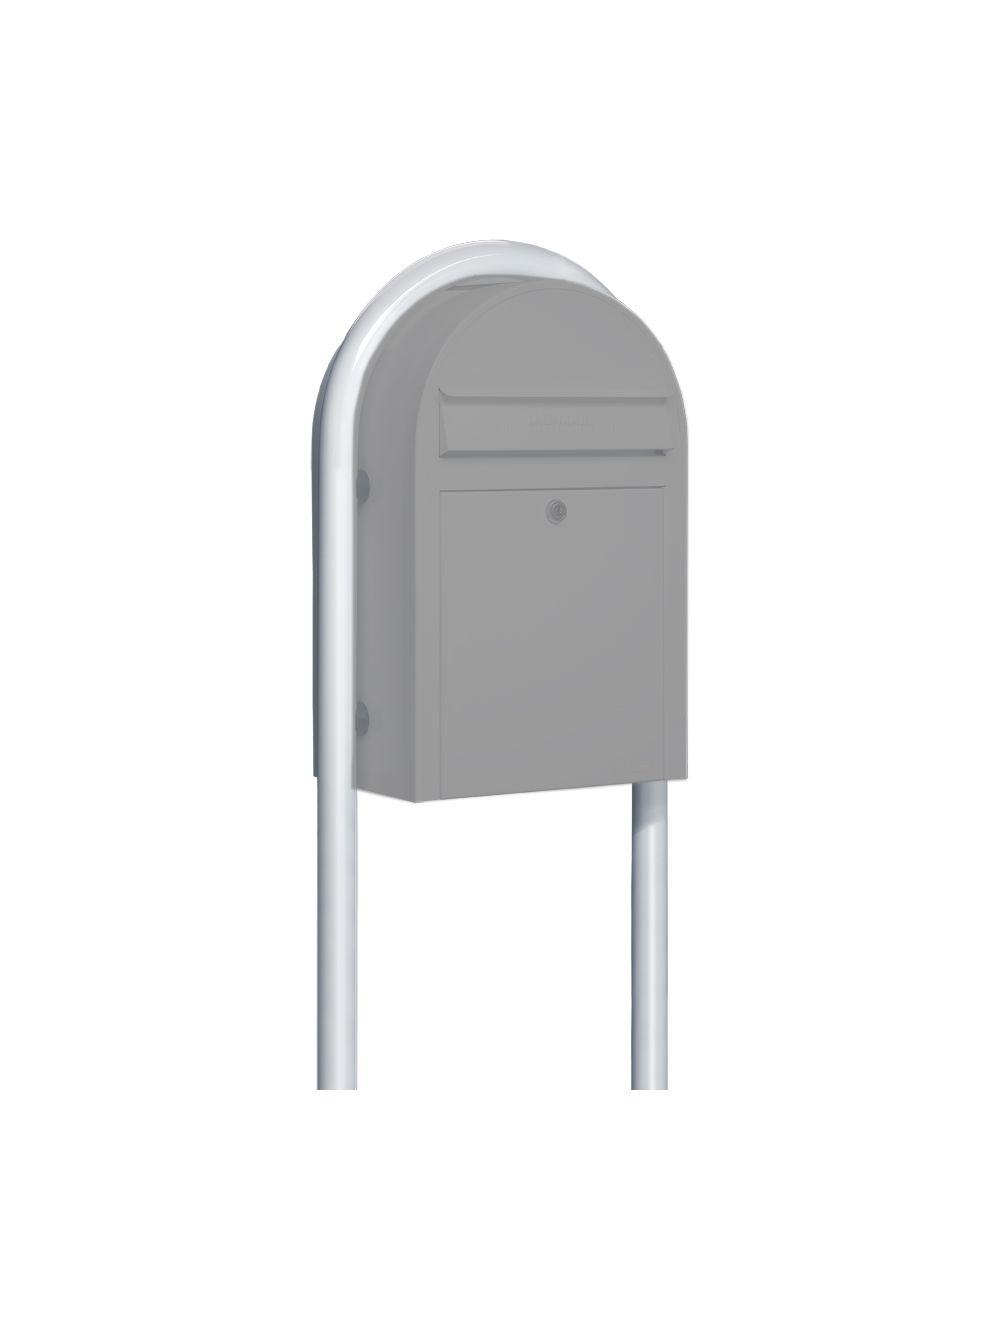 USPS Bobi White Round Mailbox Post